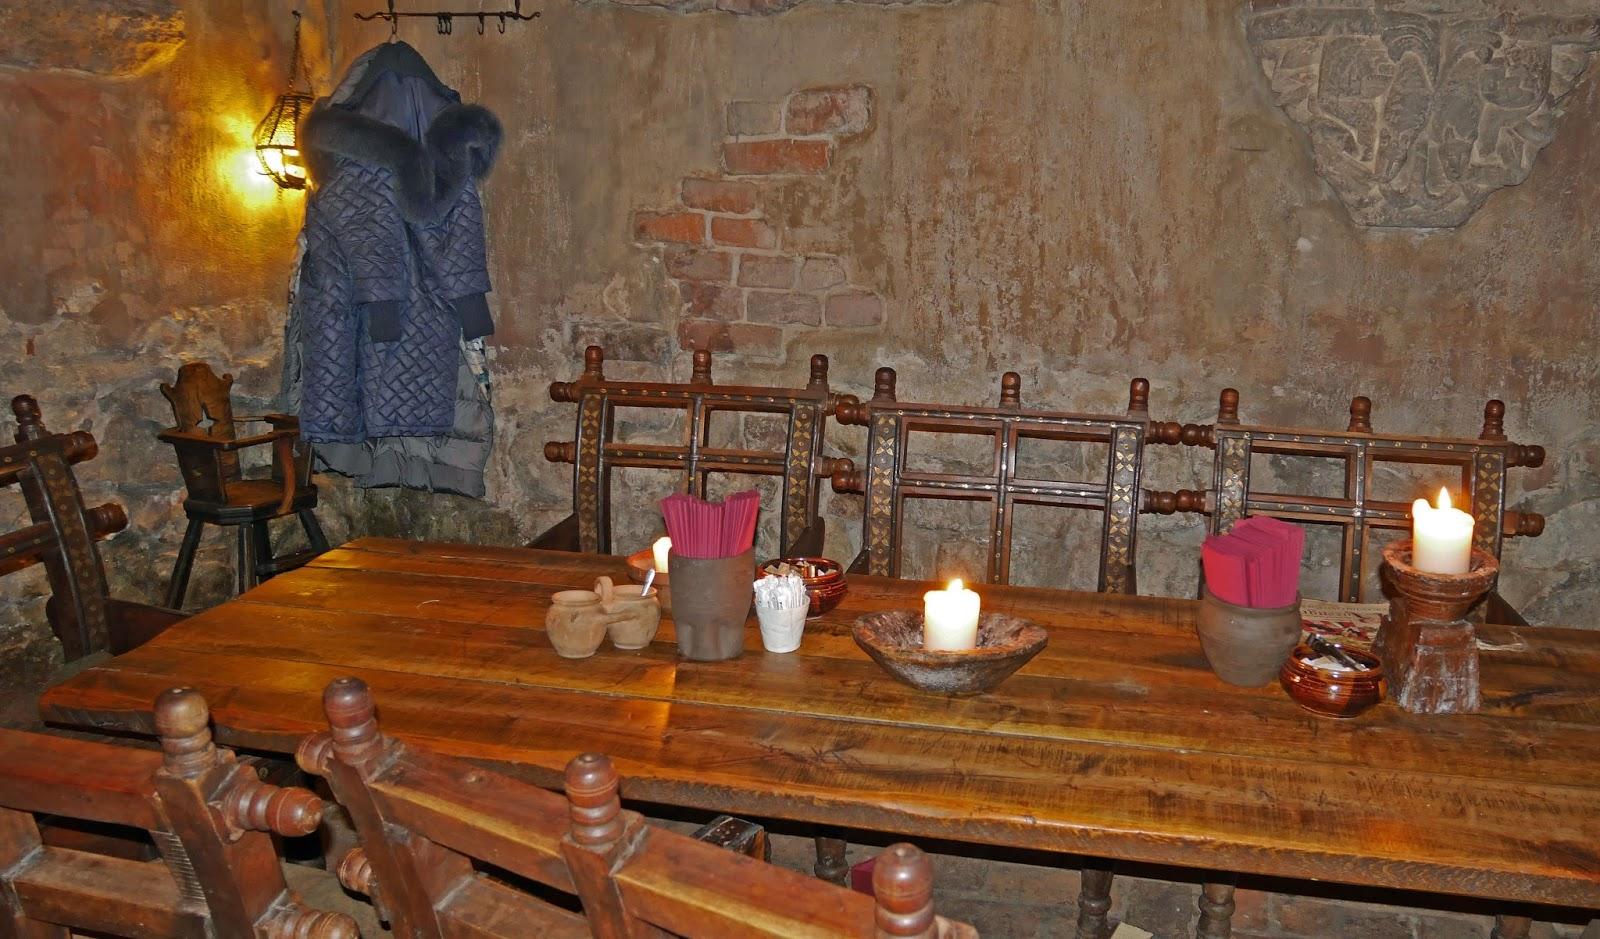 Table setup at Rozengrāls Medieval Restaurant in Riga, Latvia